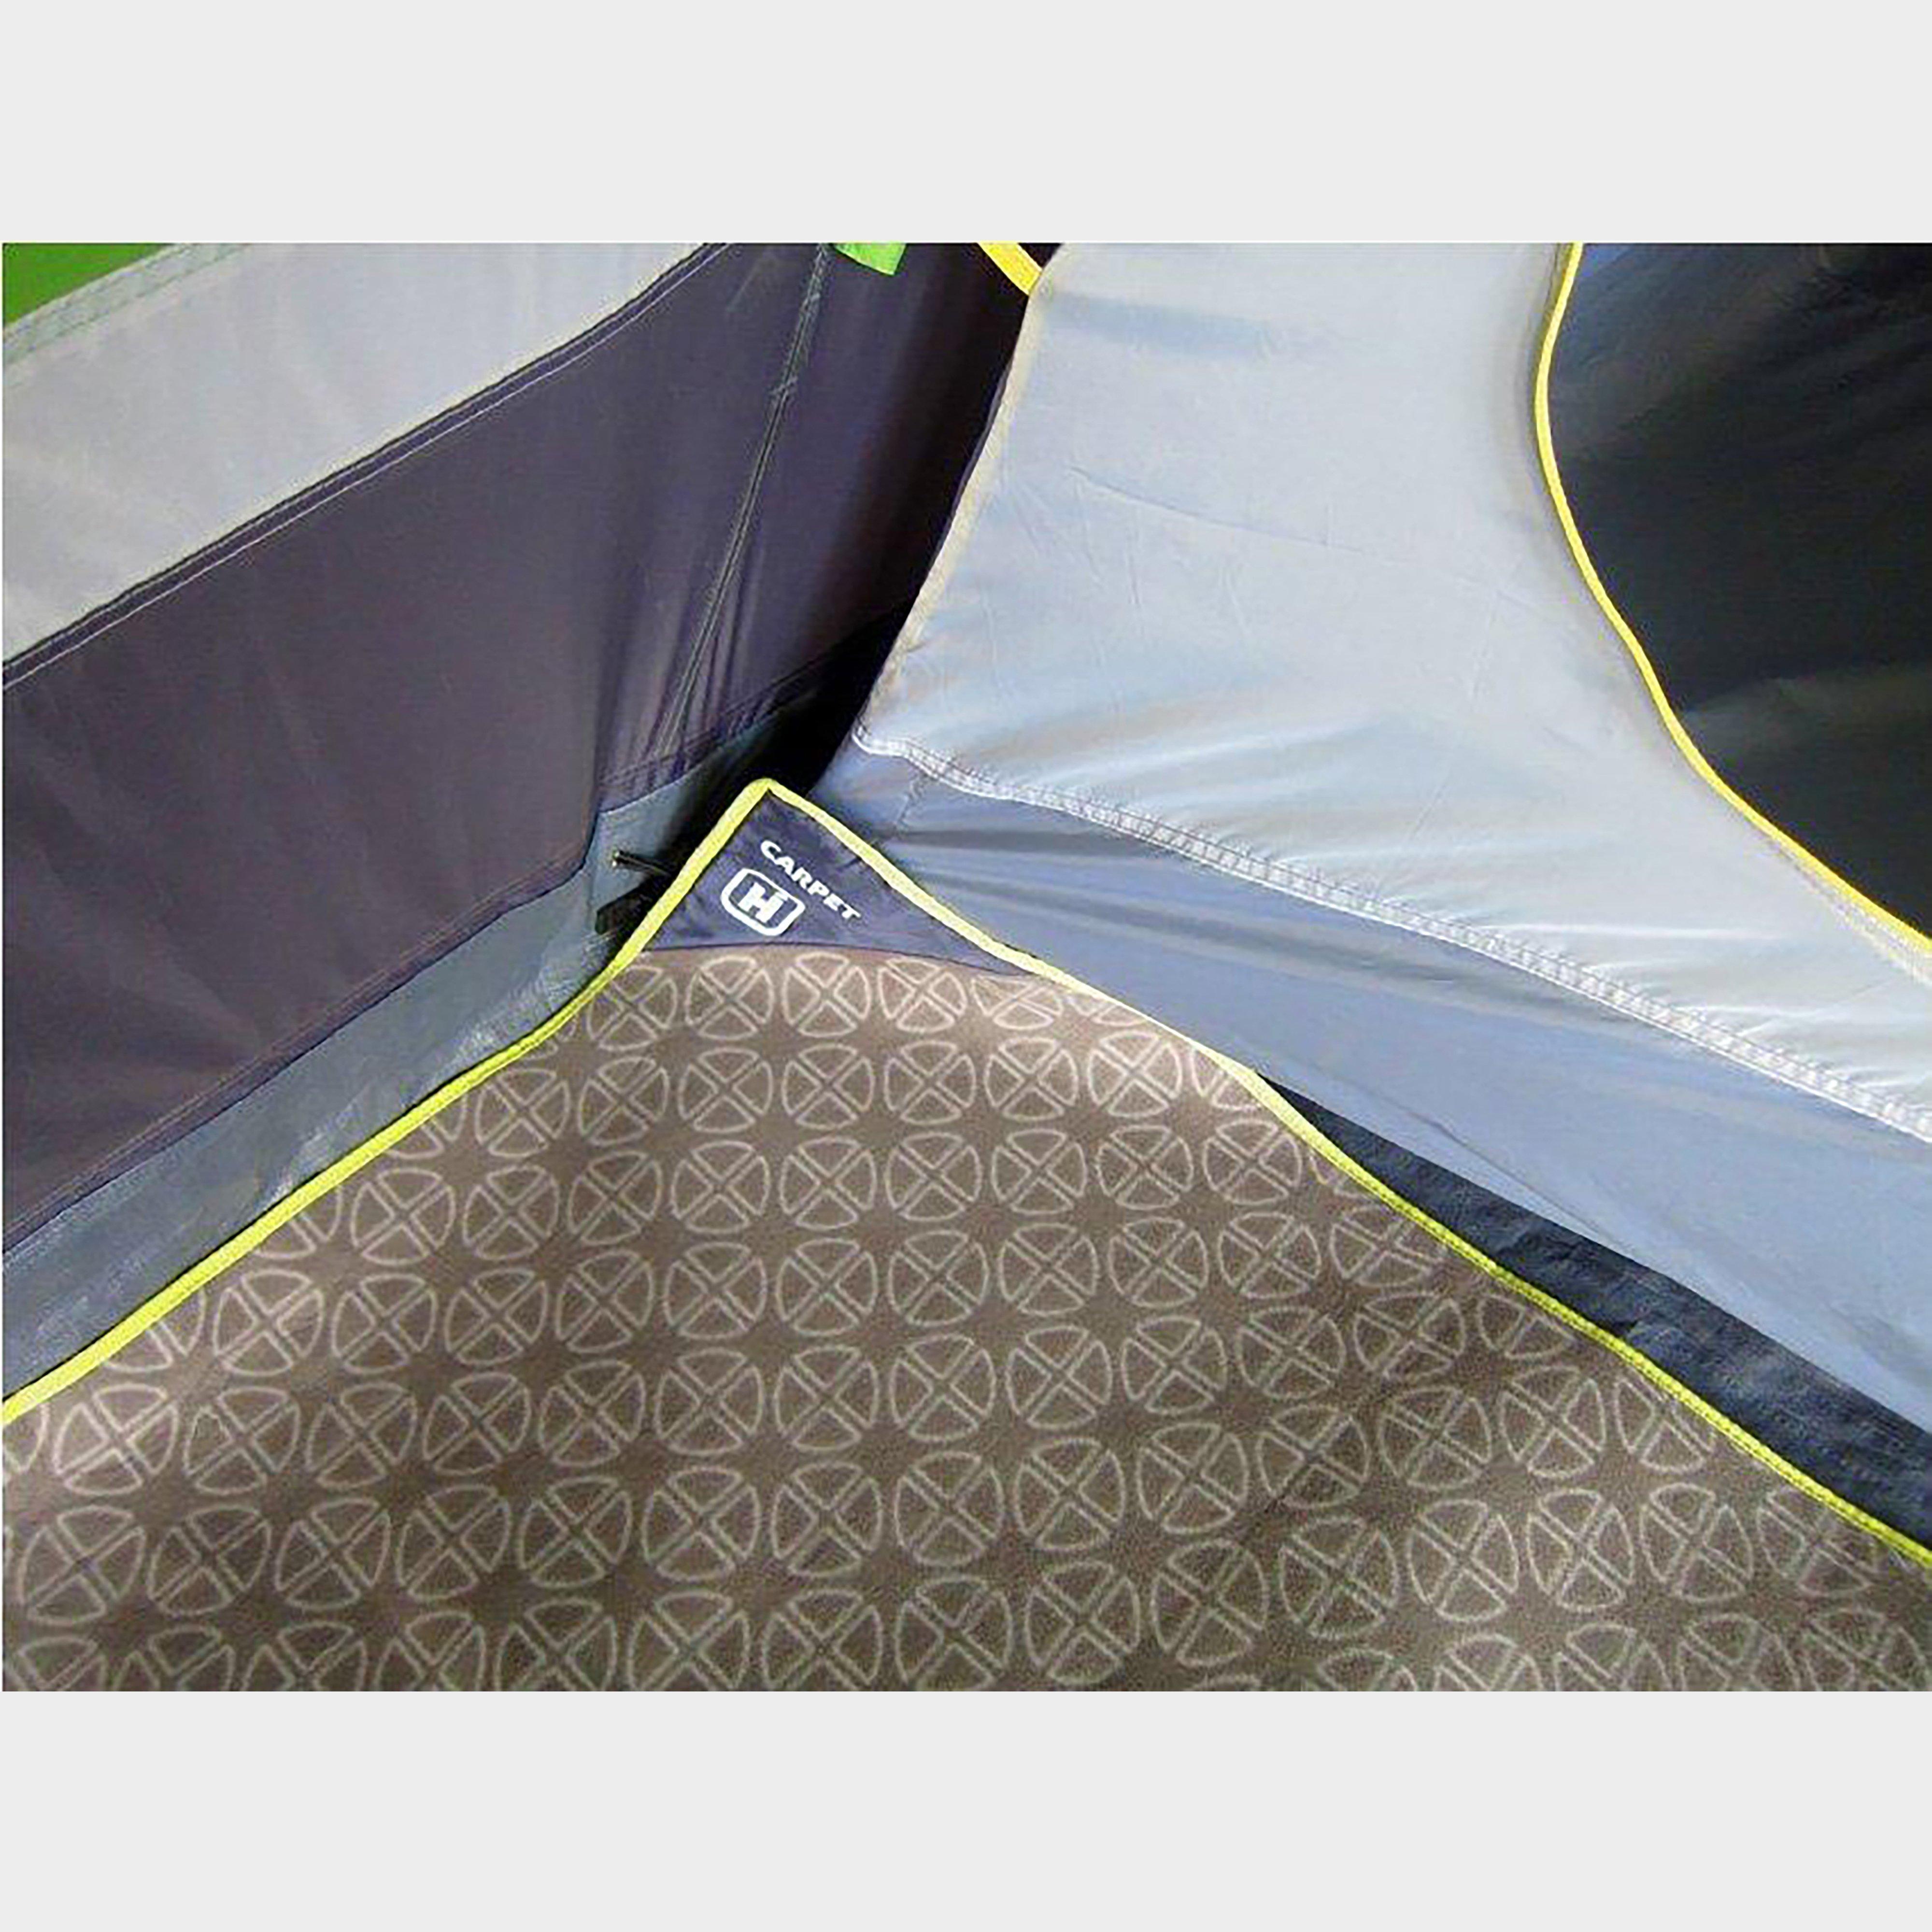 Hi-Gear Vanguard 6 Carpet - Carpet/Carpet, CARPET/CARPET